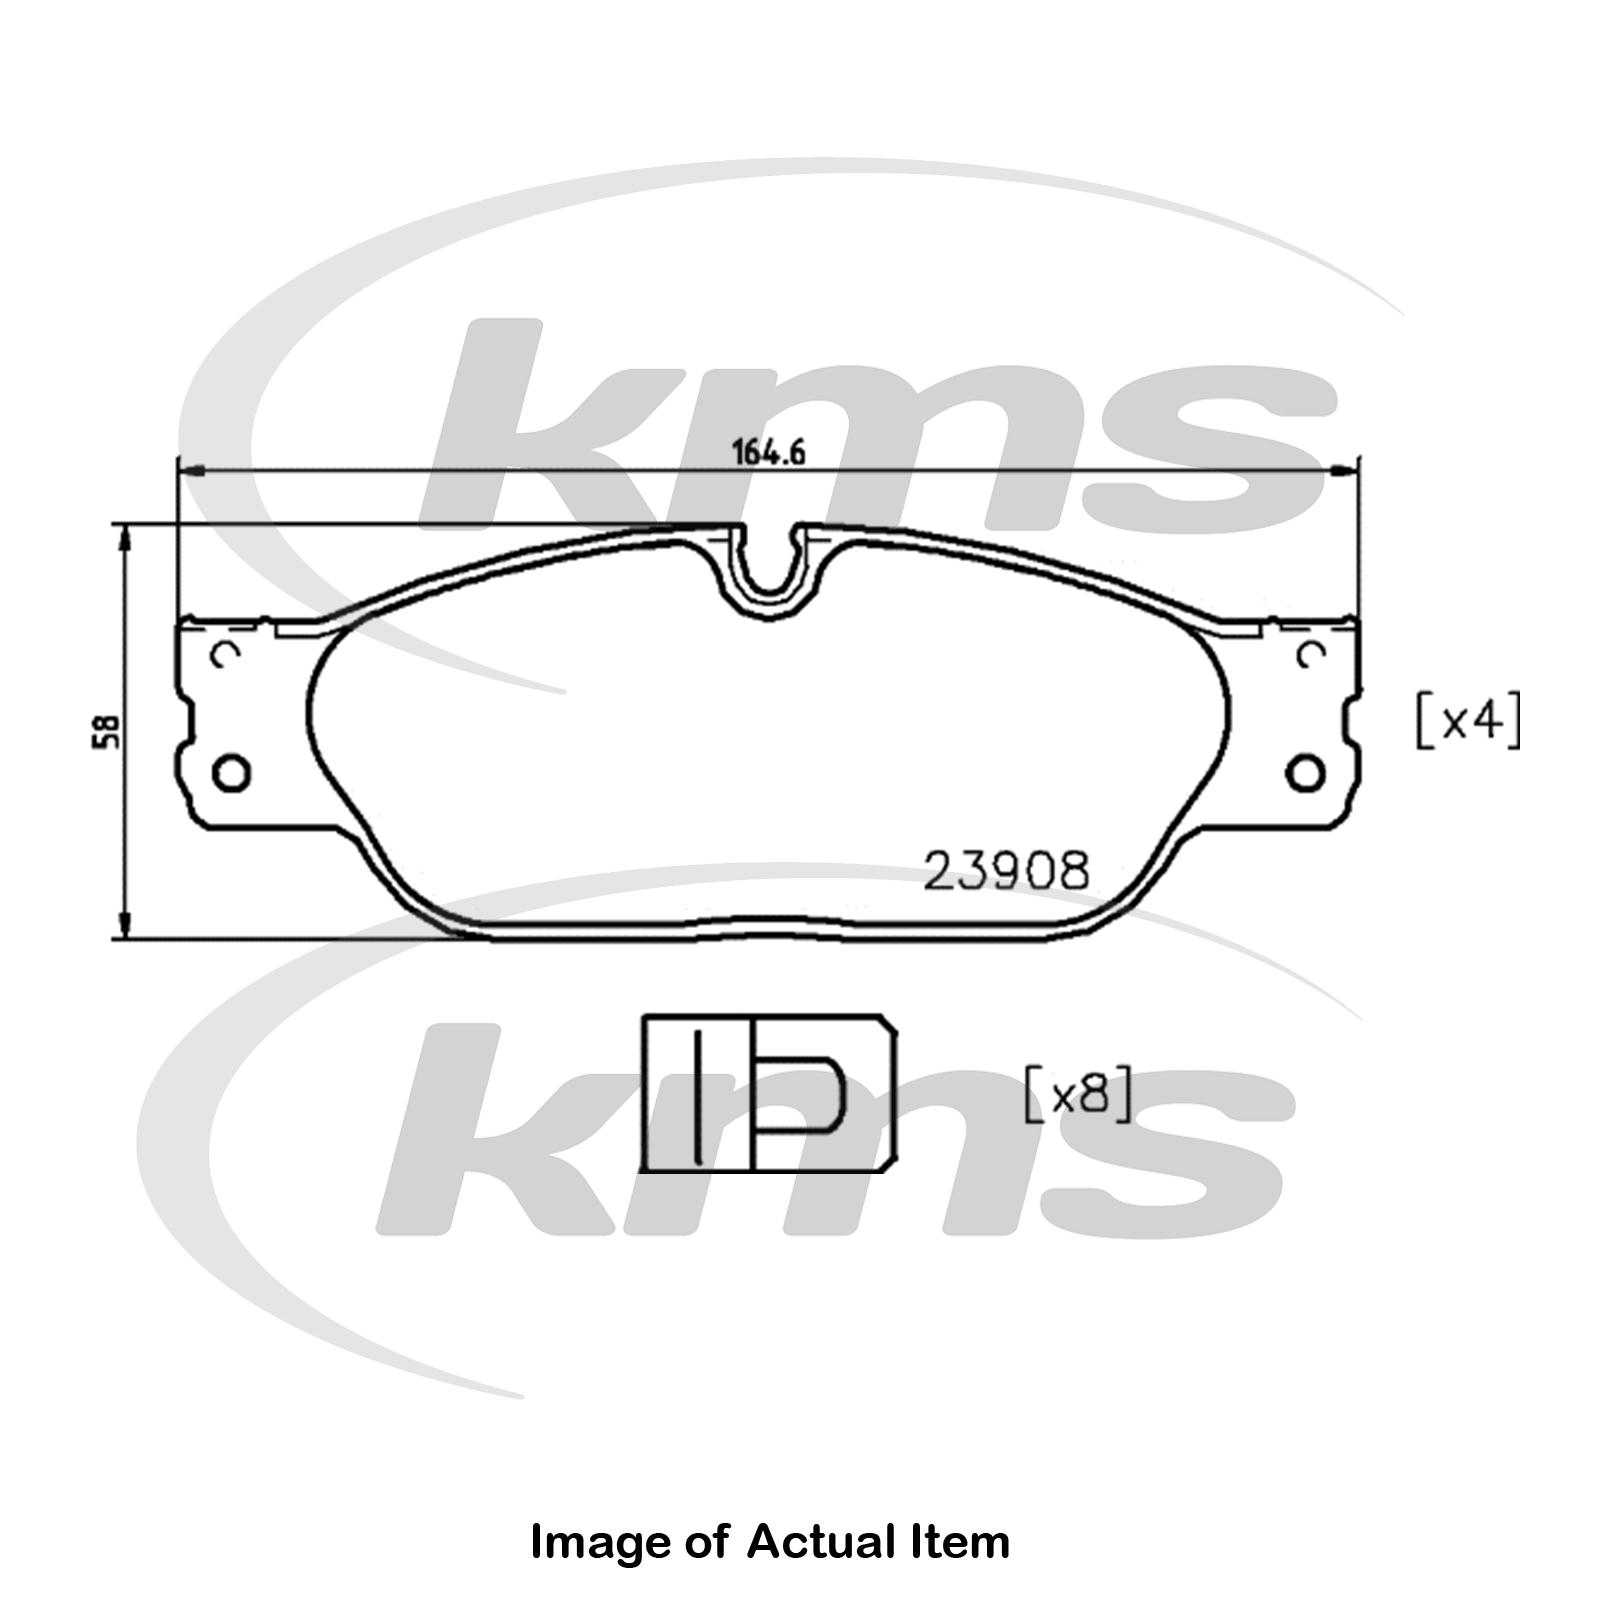 FORD BANTAM 1.8D Sump Gasket 01 to 06 RTP Payen 1078498 XS4Q6710AE Quality New